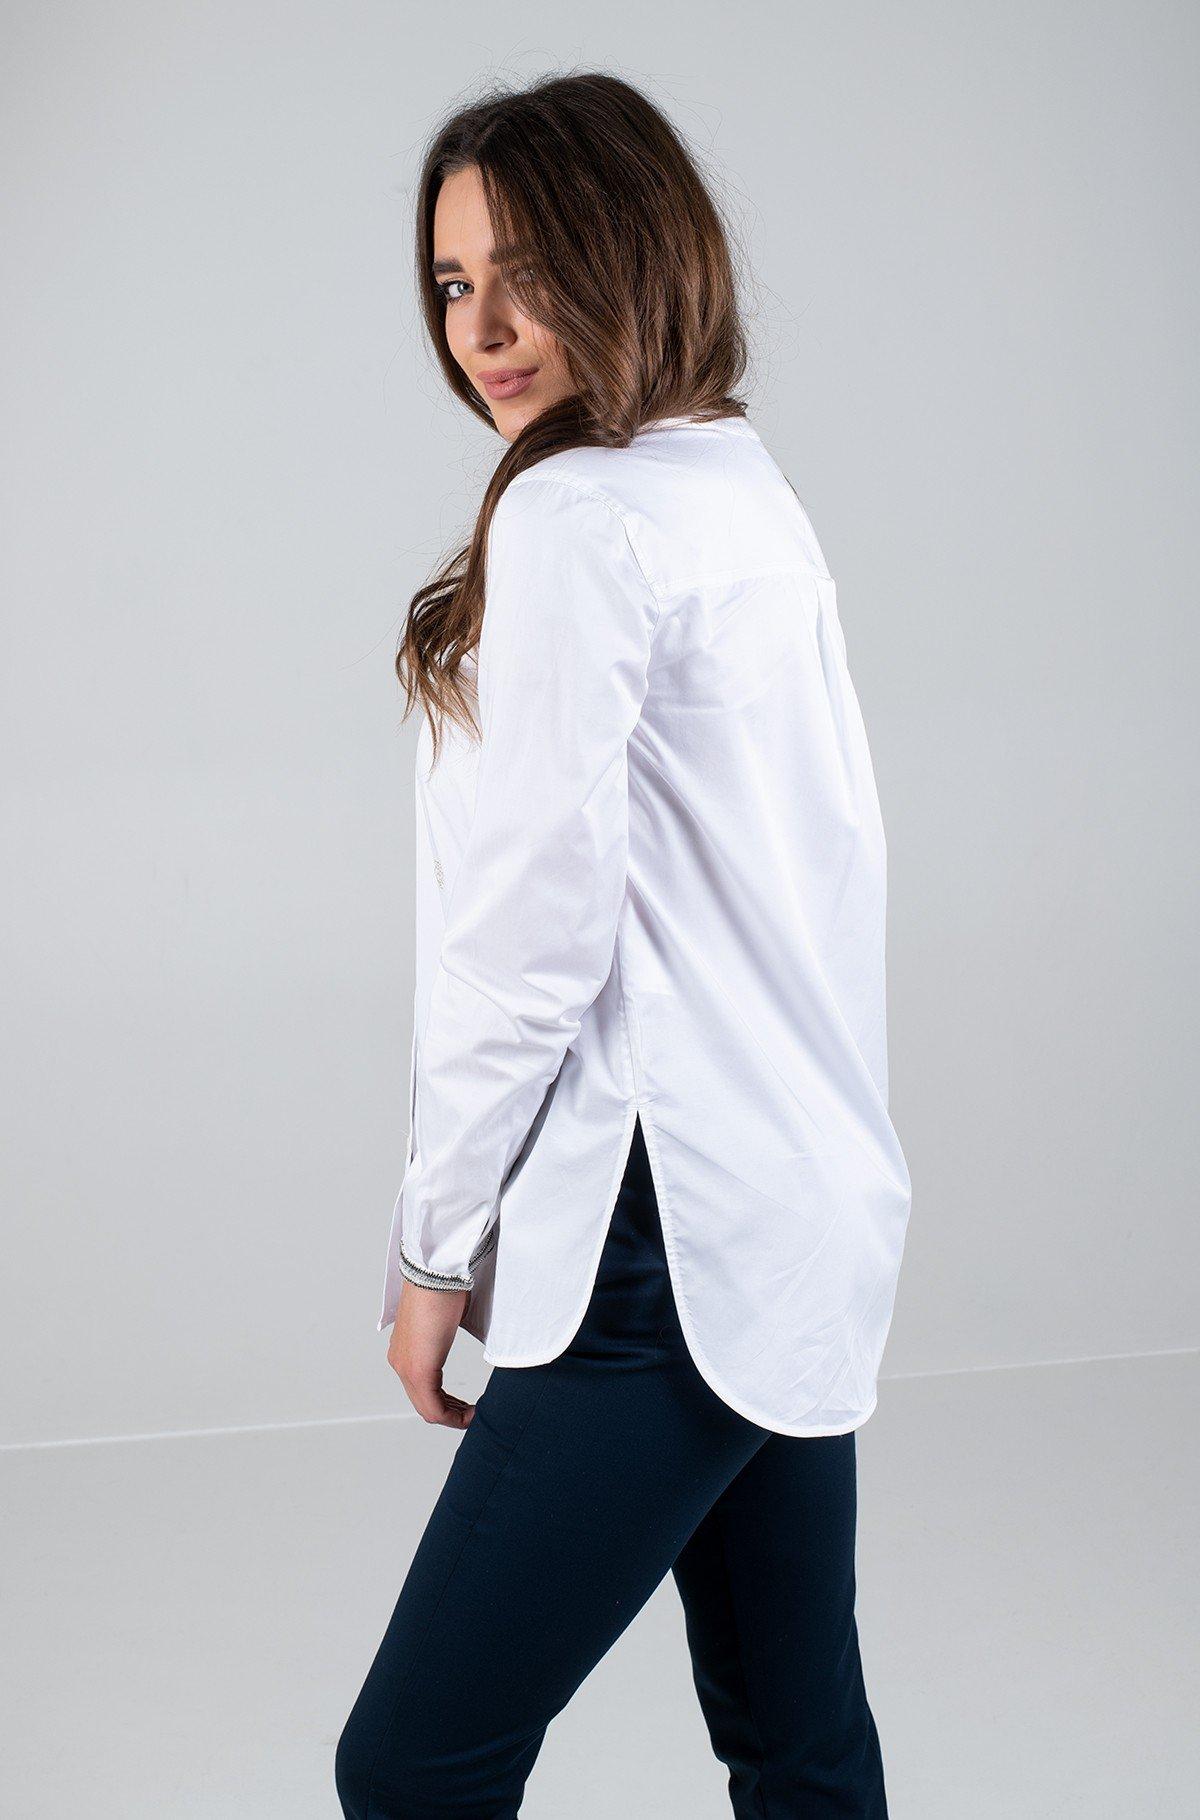 Marškiniai OC DEBBIE SHIRT LS W4-full-3